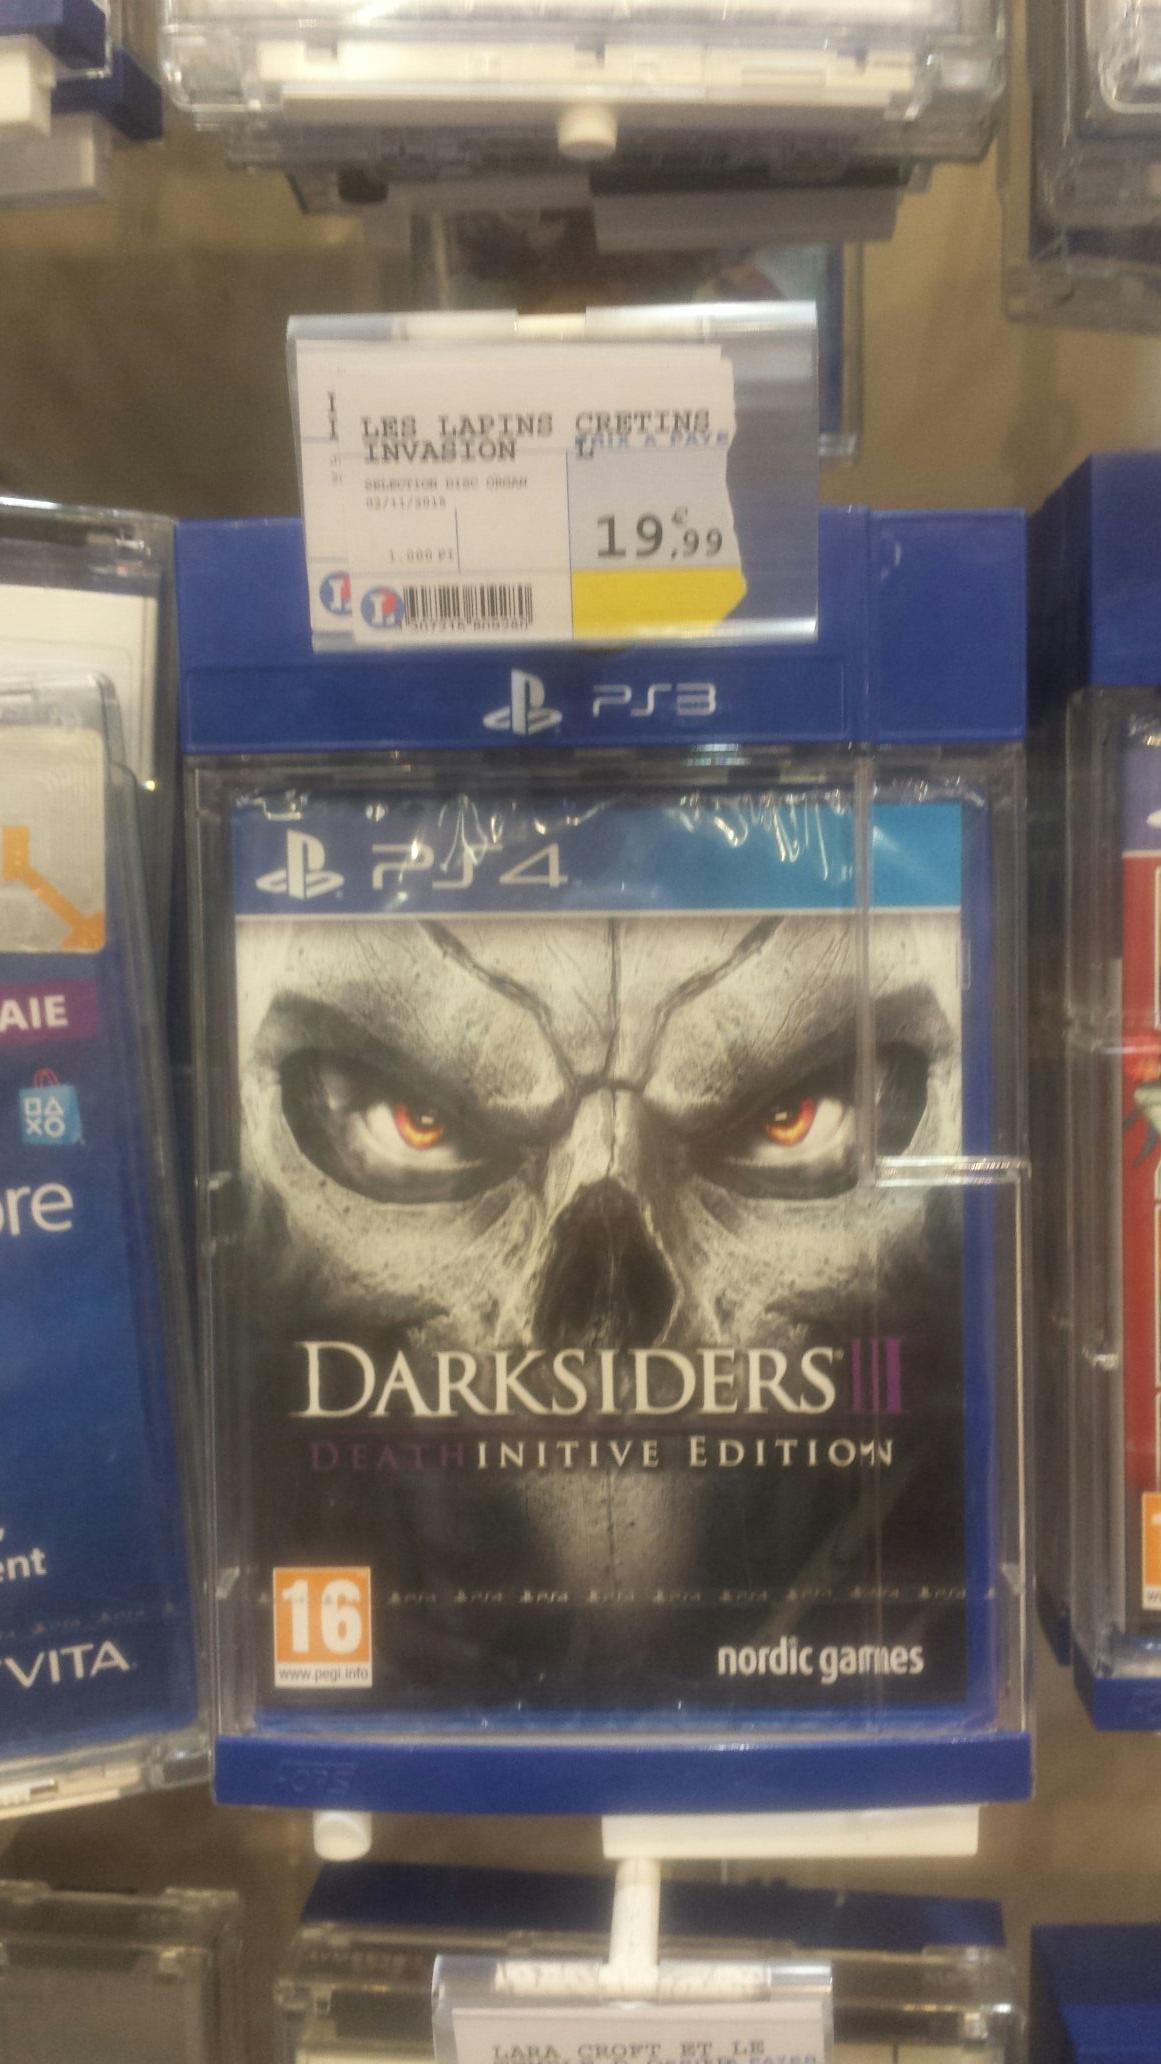 Jeu Darksiders 2 sur PS4 - Deathinitive edition